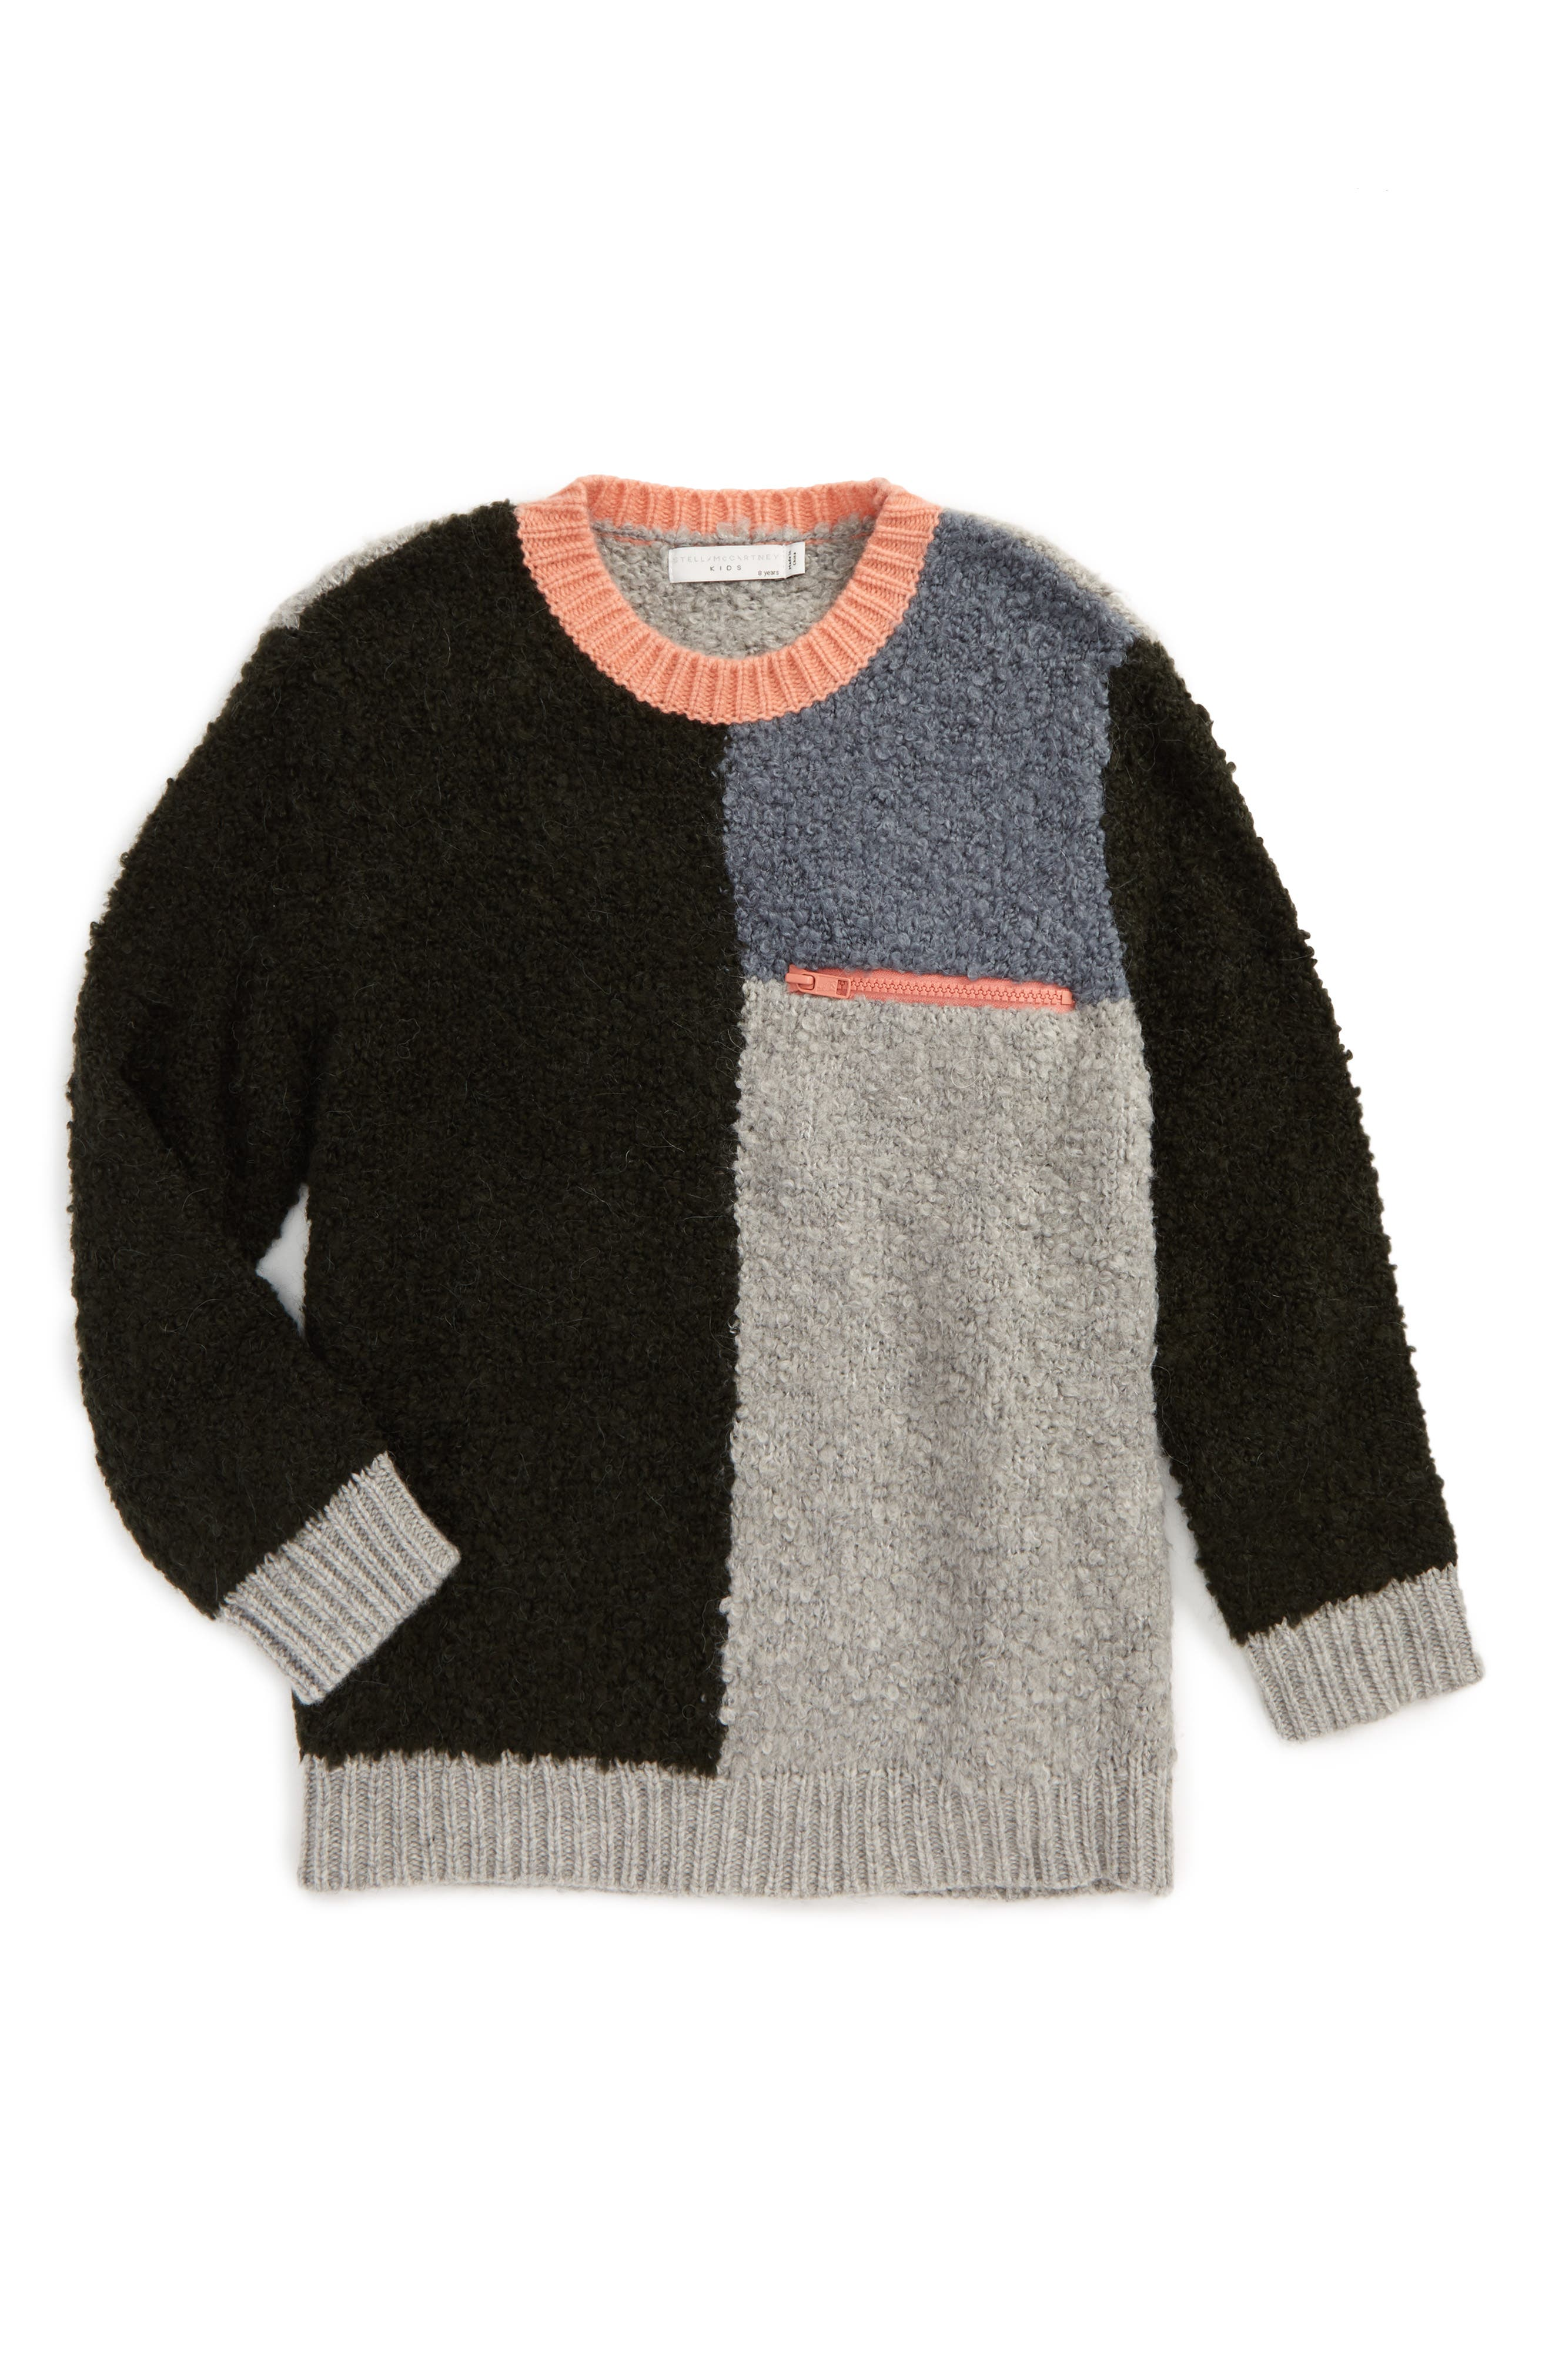 Stella McCartney Kids Maya Colorblock Sweater (Toddler Girls, Little Girls & Big Girls)